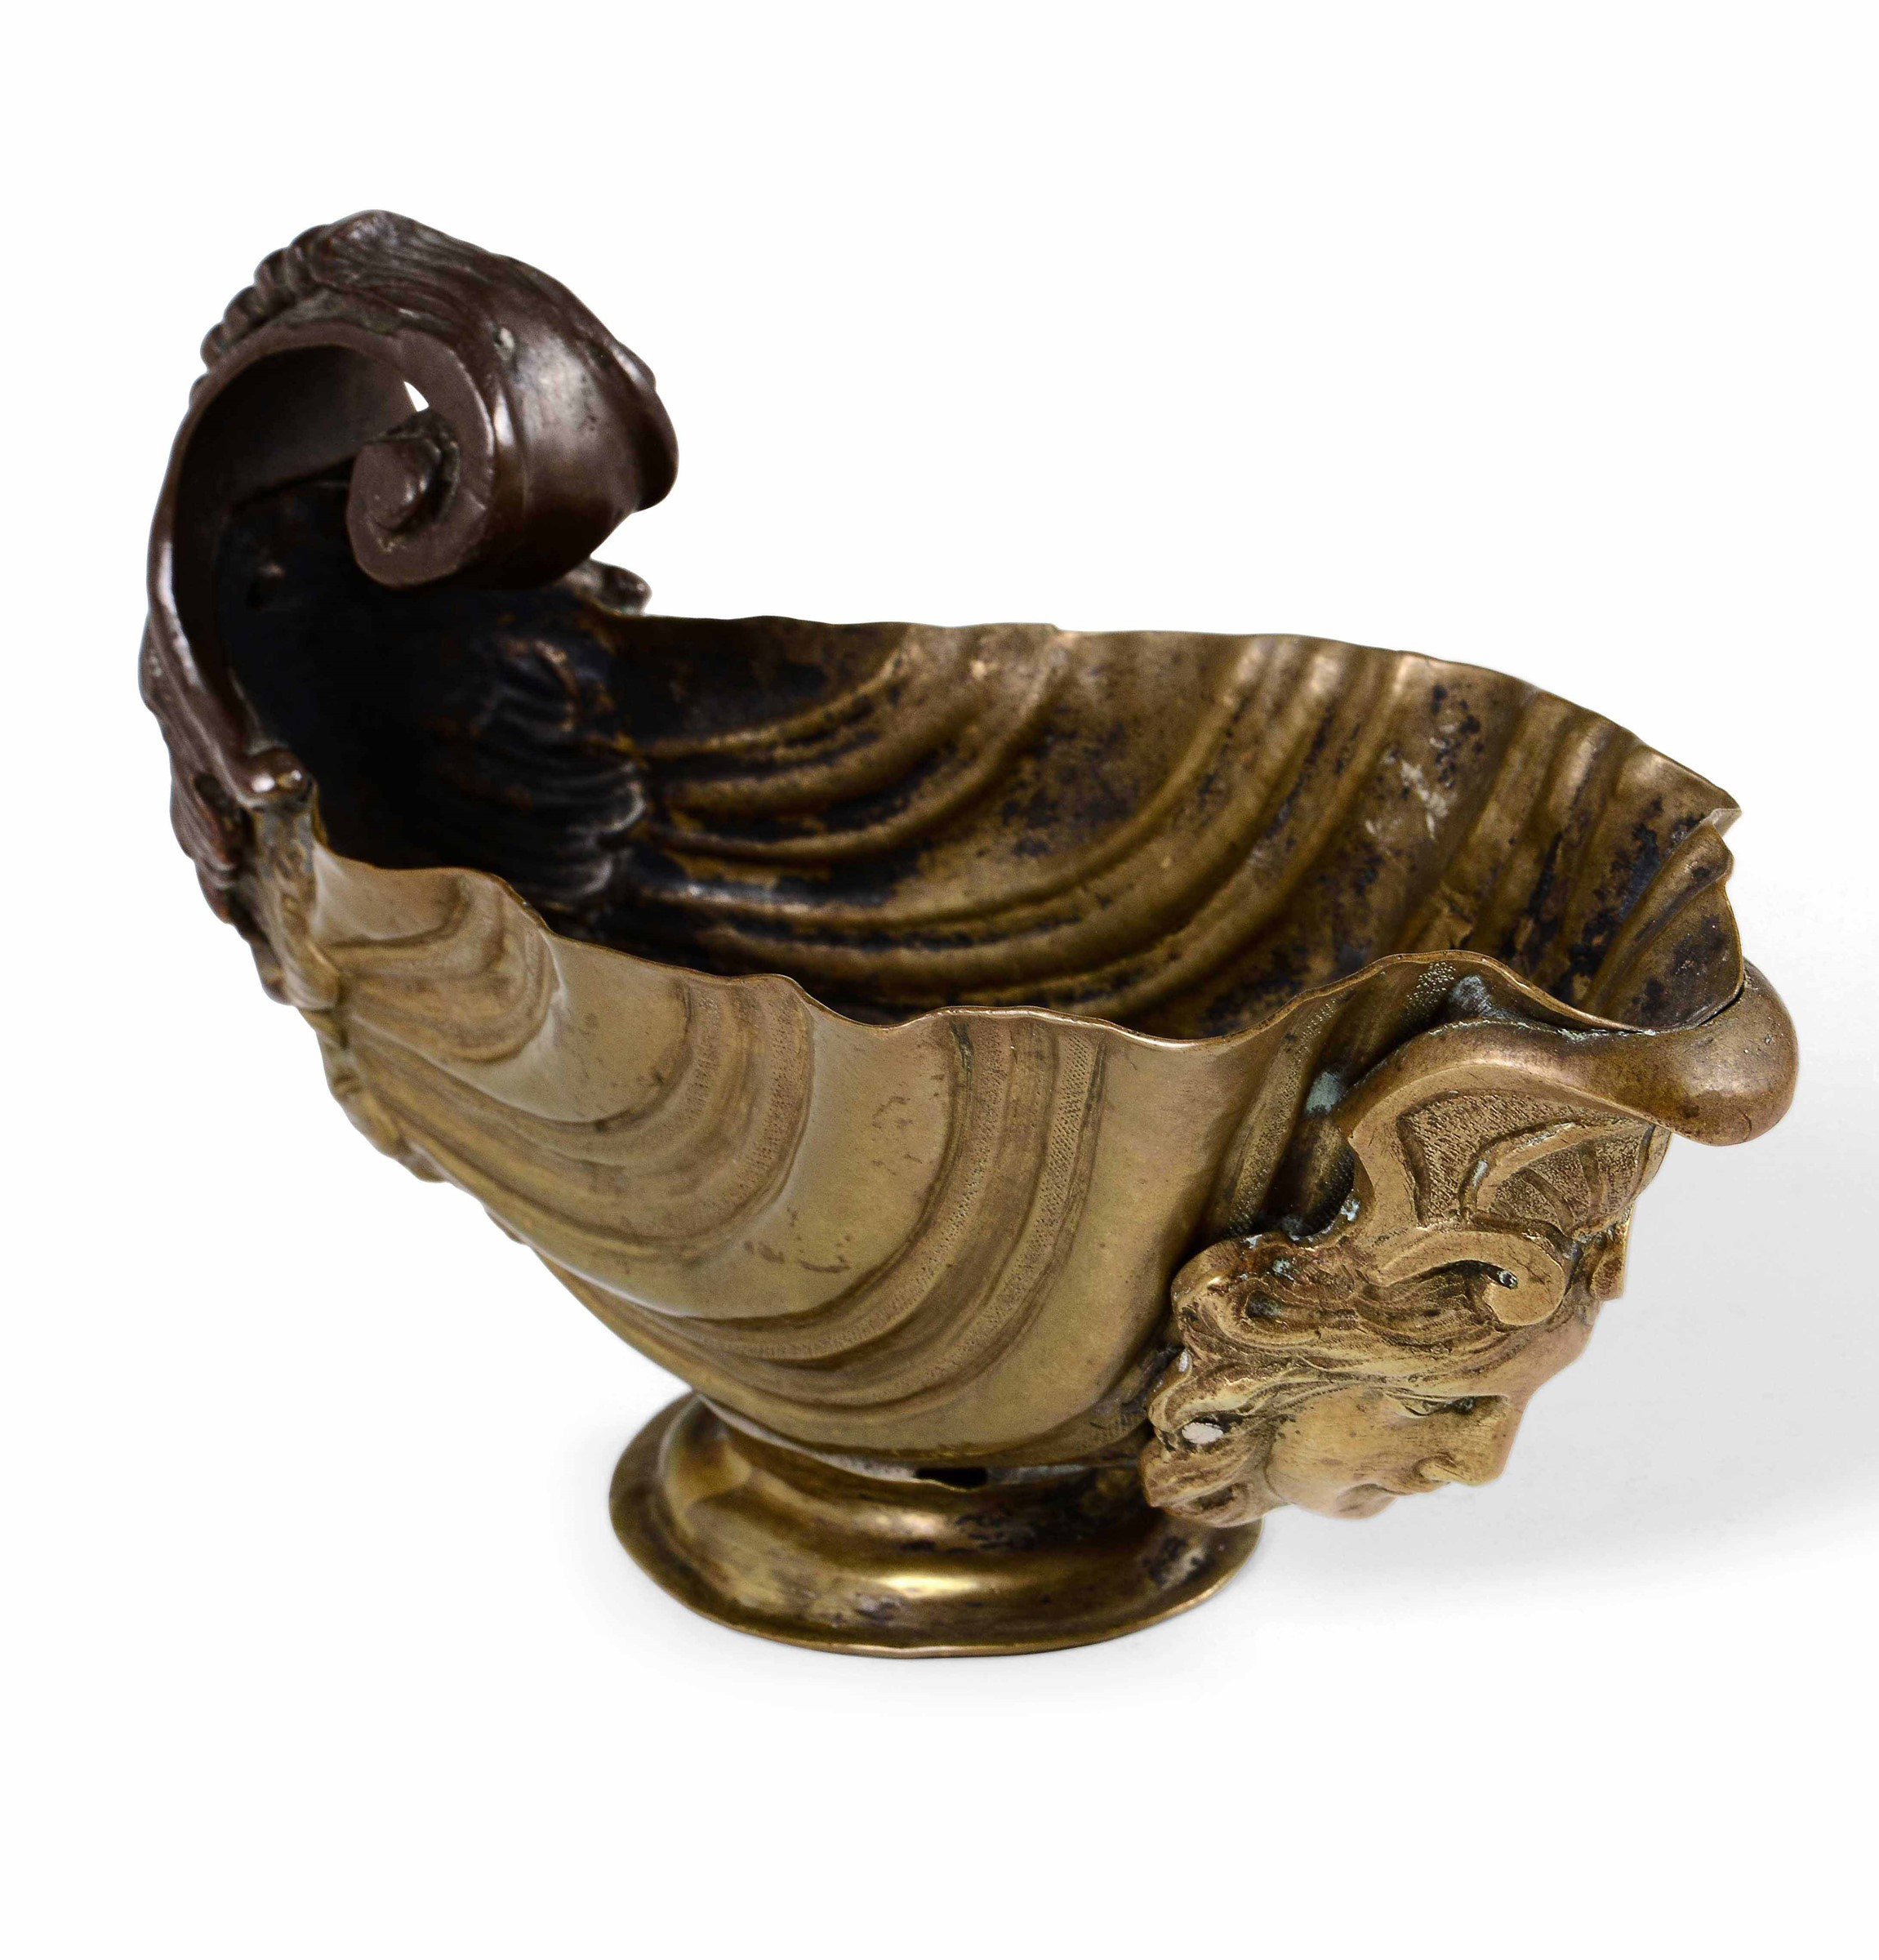 A copper and bronze pitcher, 1700s - cm 15x7x9,5 -